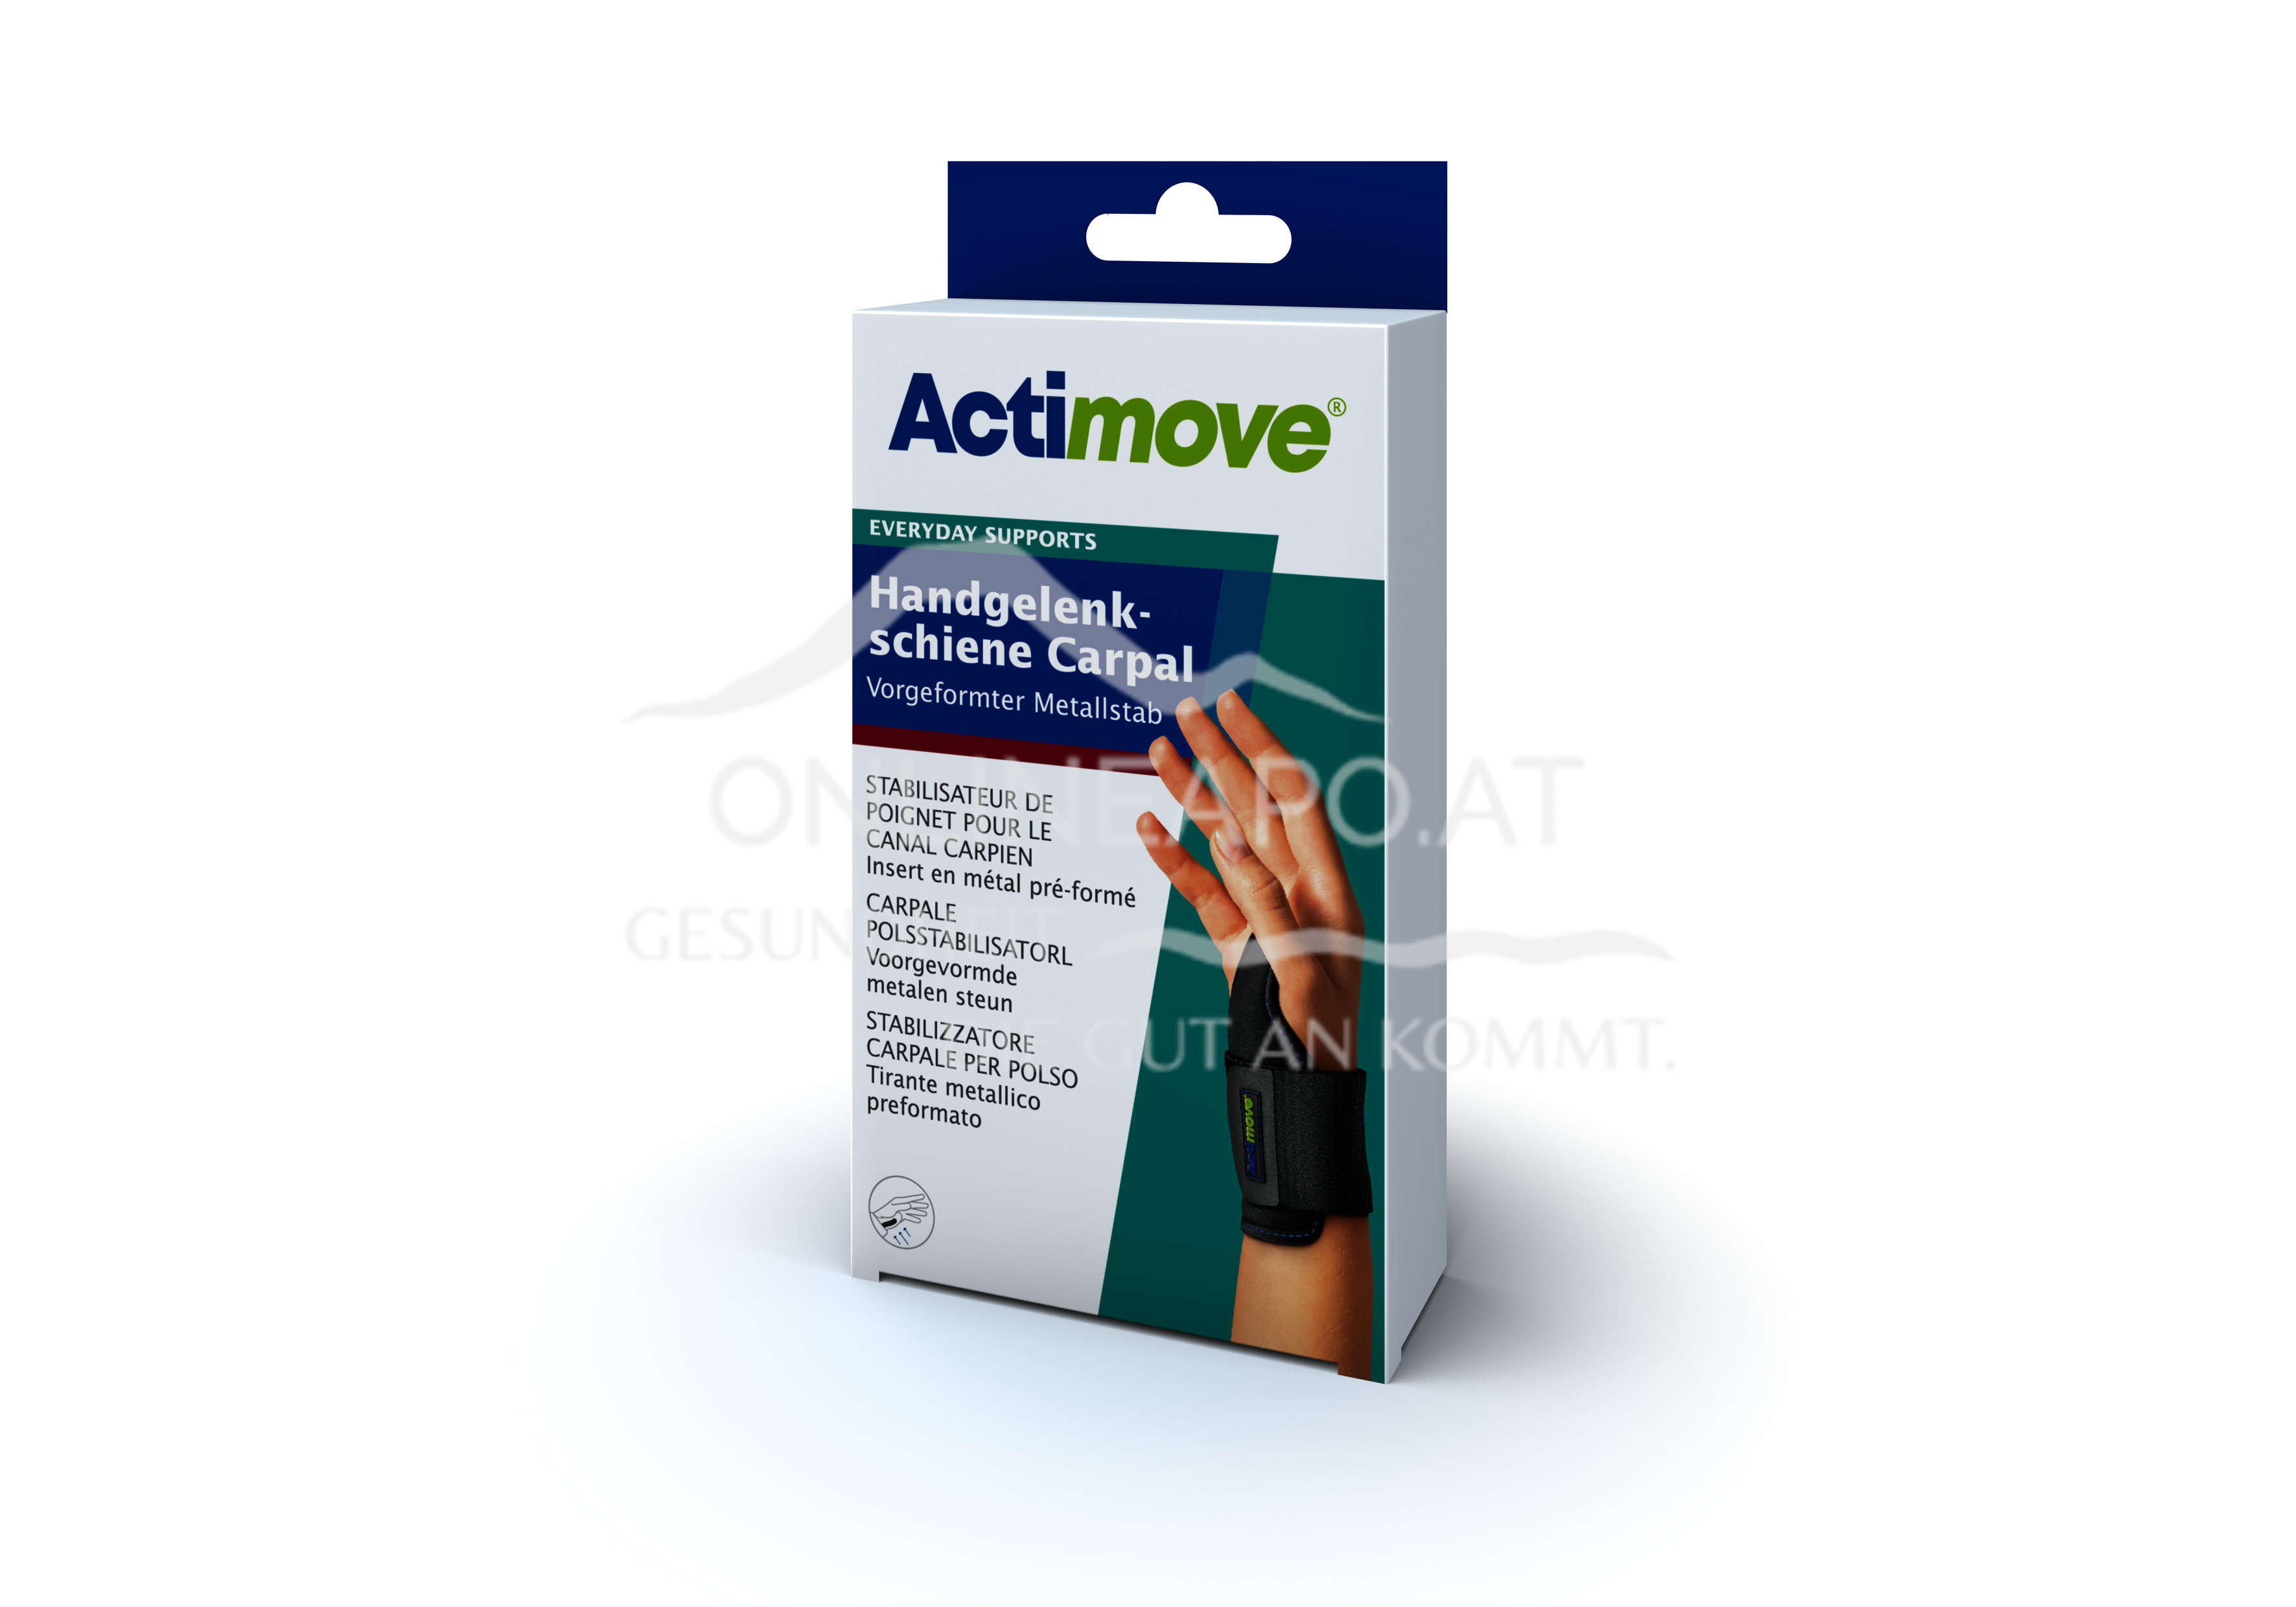 Actimove® Everyday Supports Handgelenkschiene Carpal